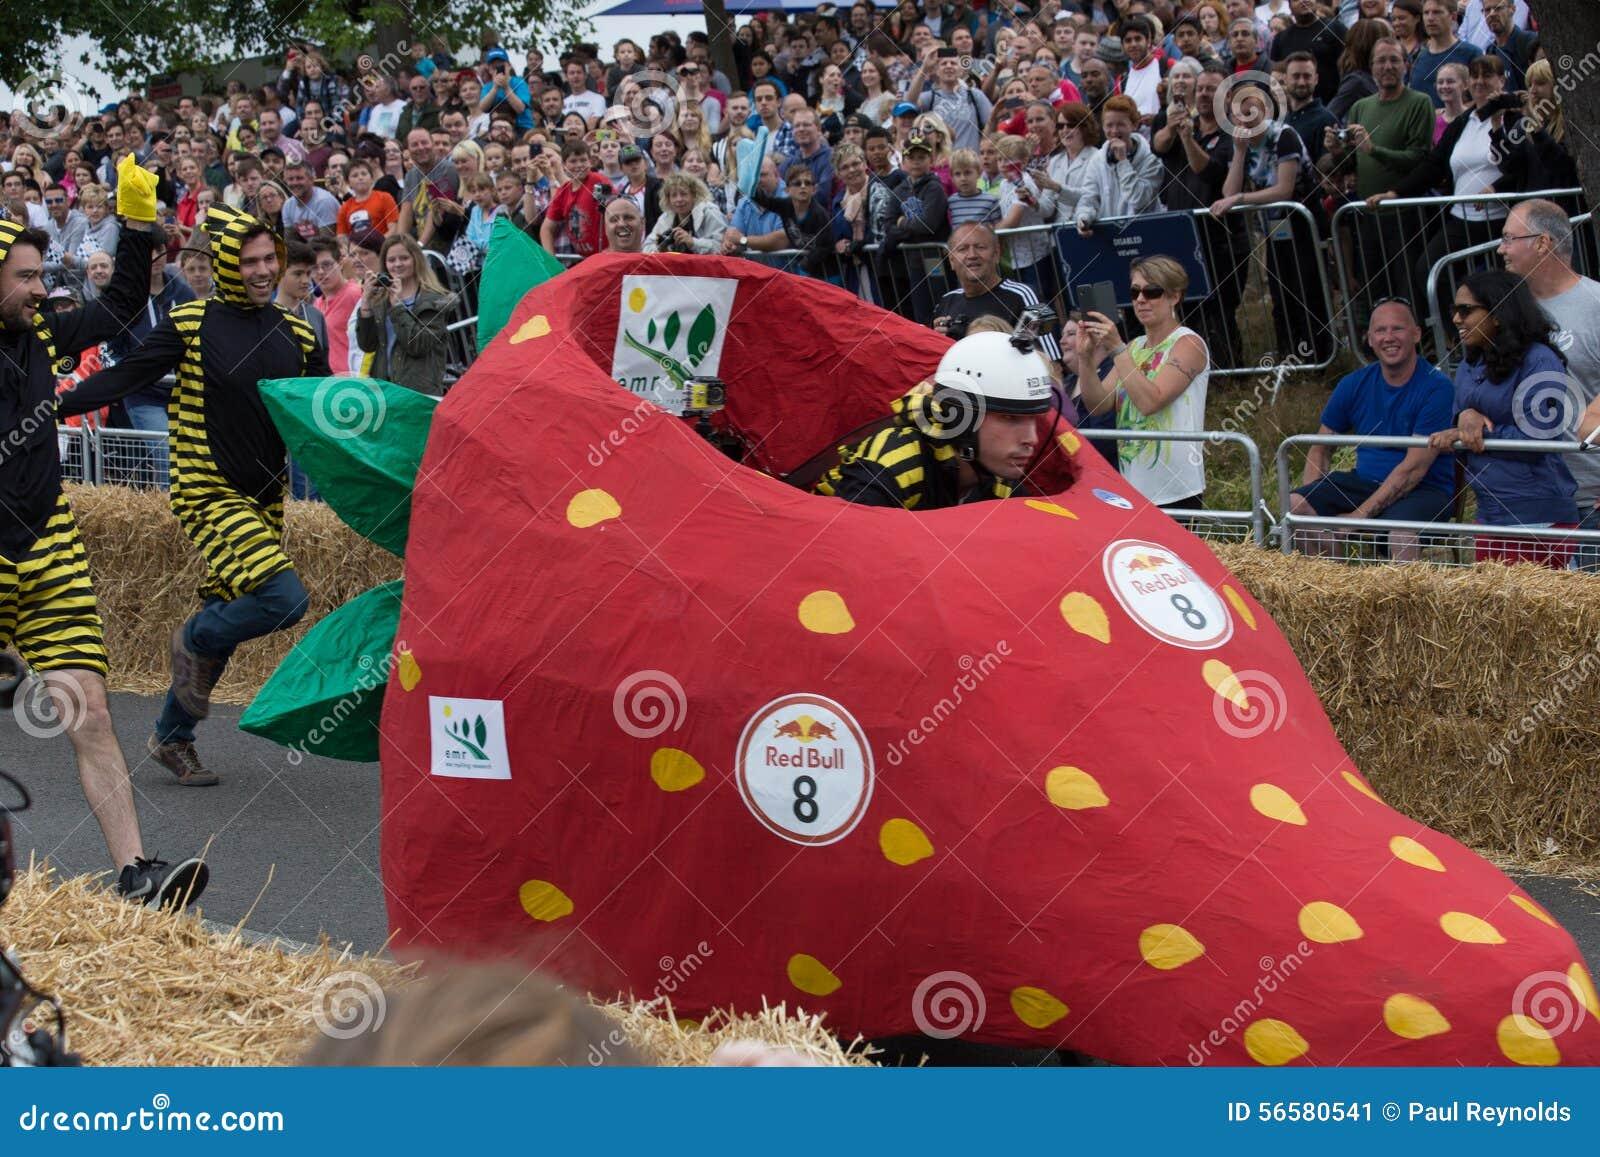 Redbull Soapbox Race 2015